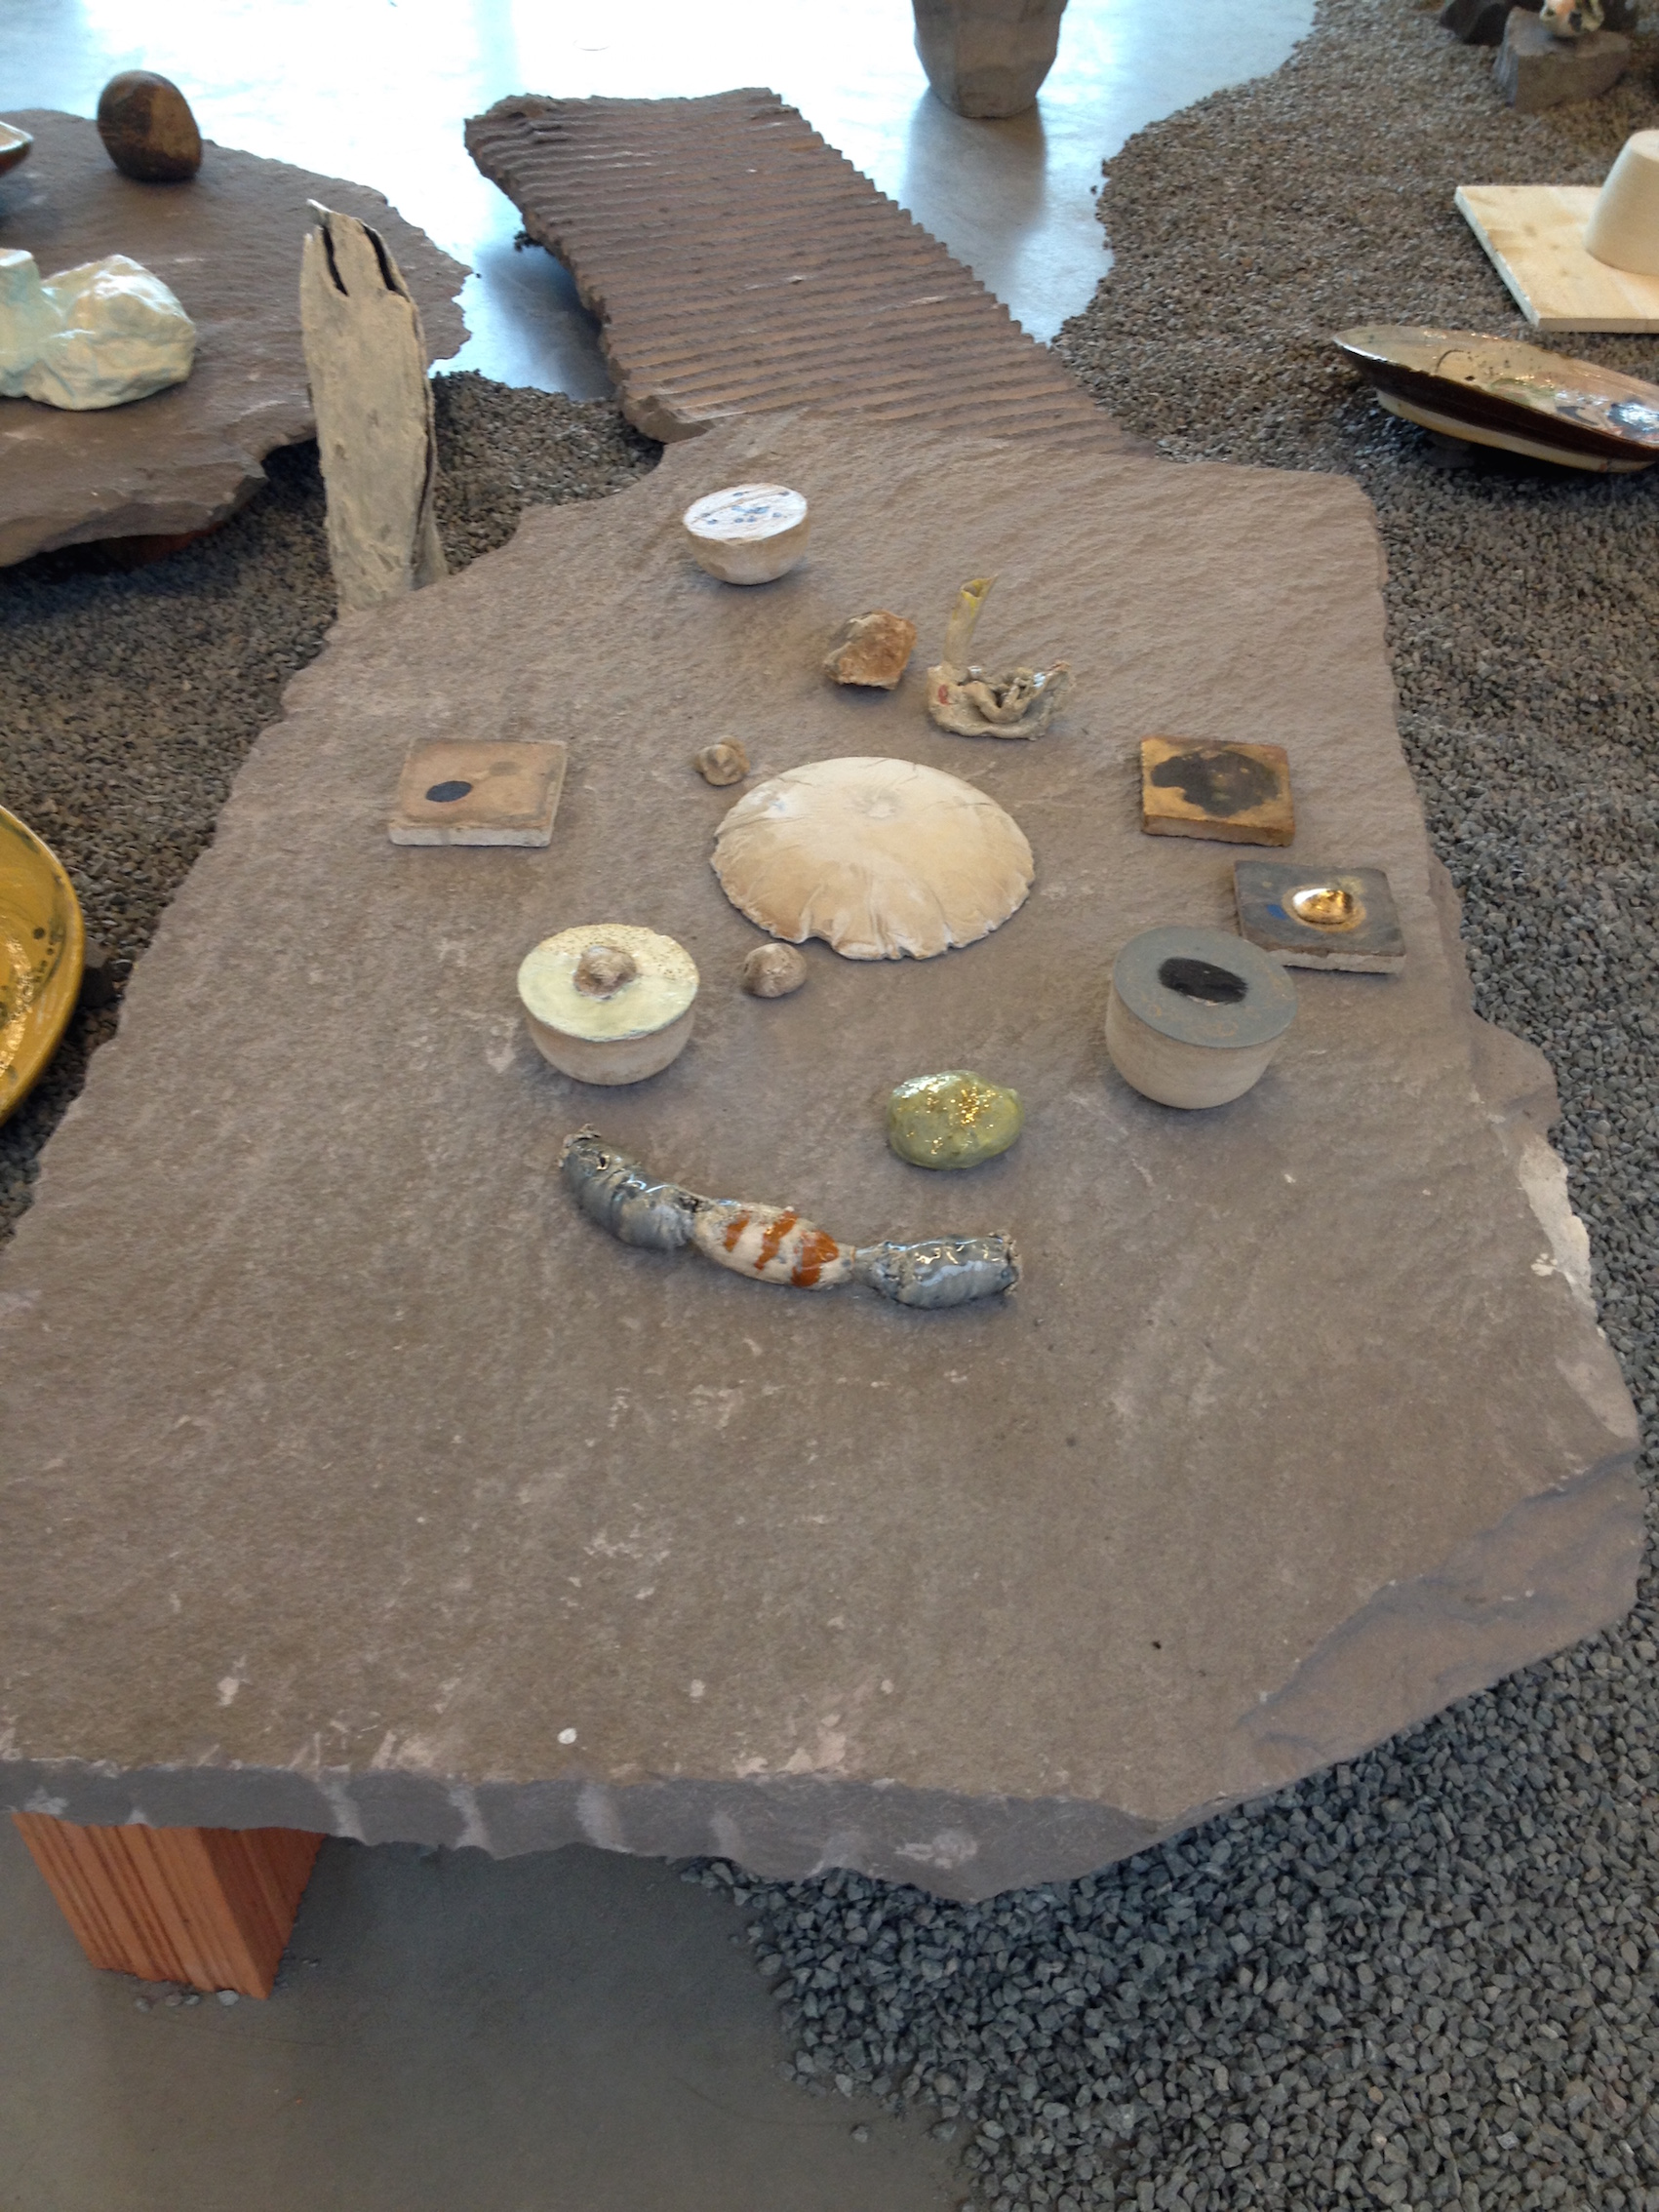 Dionysus Kit (2015),concrete, Glazed Ceramic, Shell, Fossils, Wax, Gold  Paint, Stone, Bricks (installation View At La Box, ENSA, Bourges)